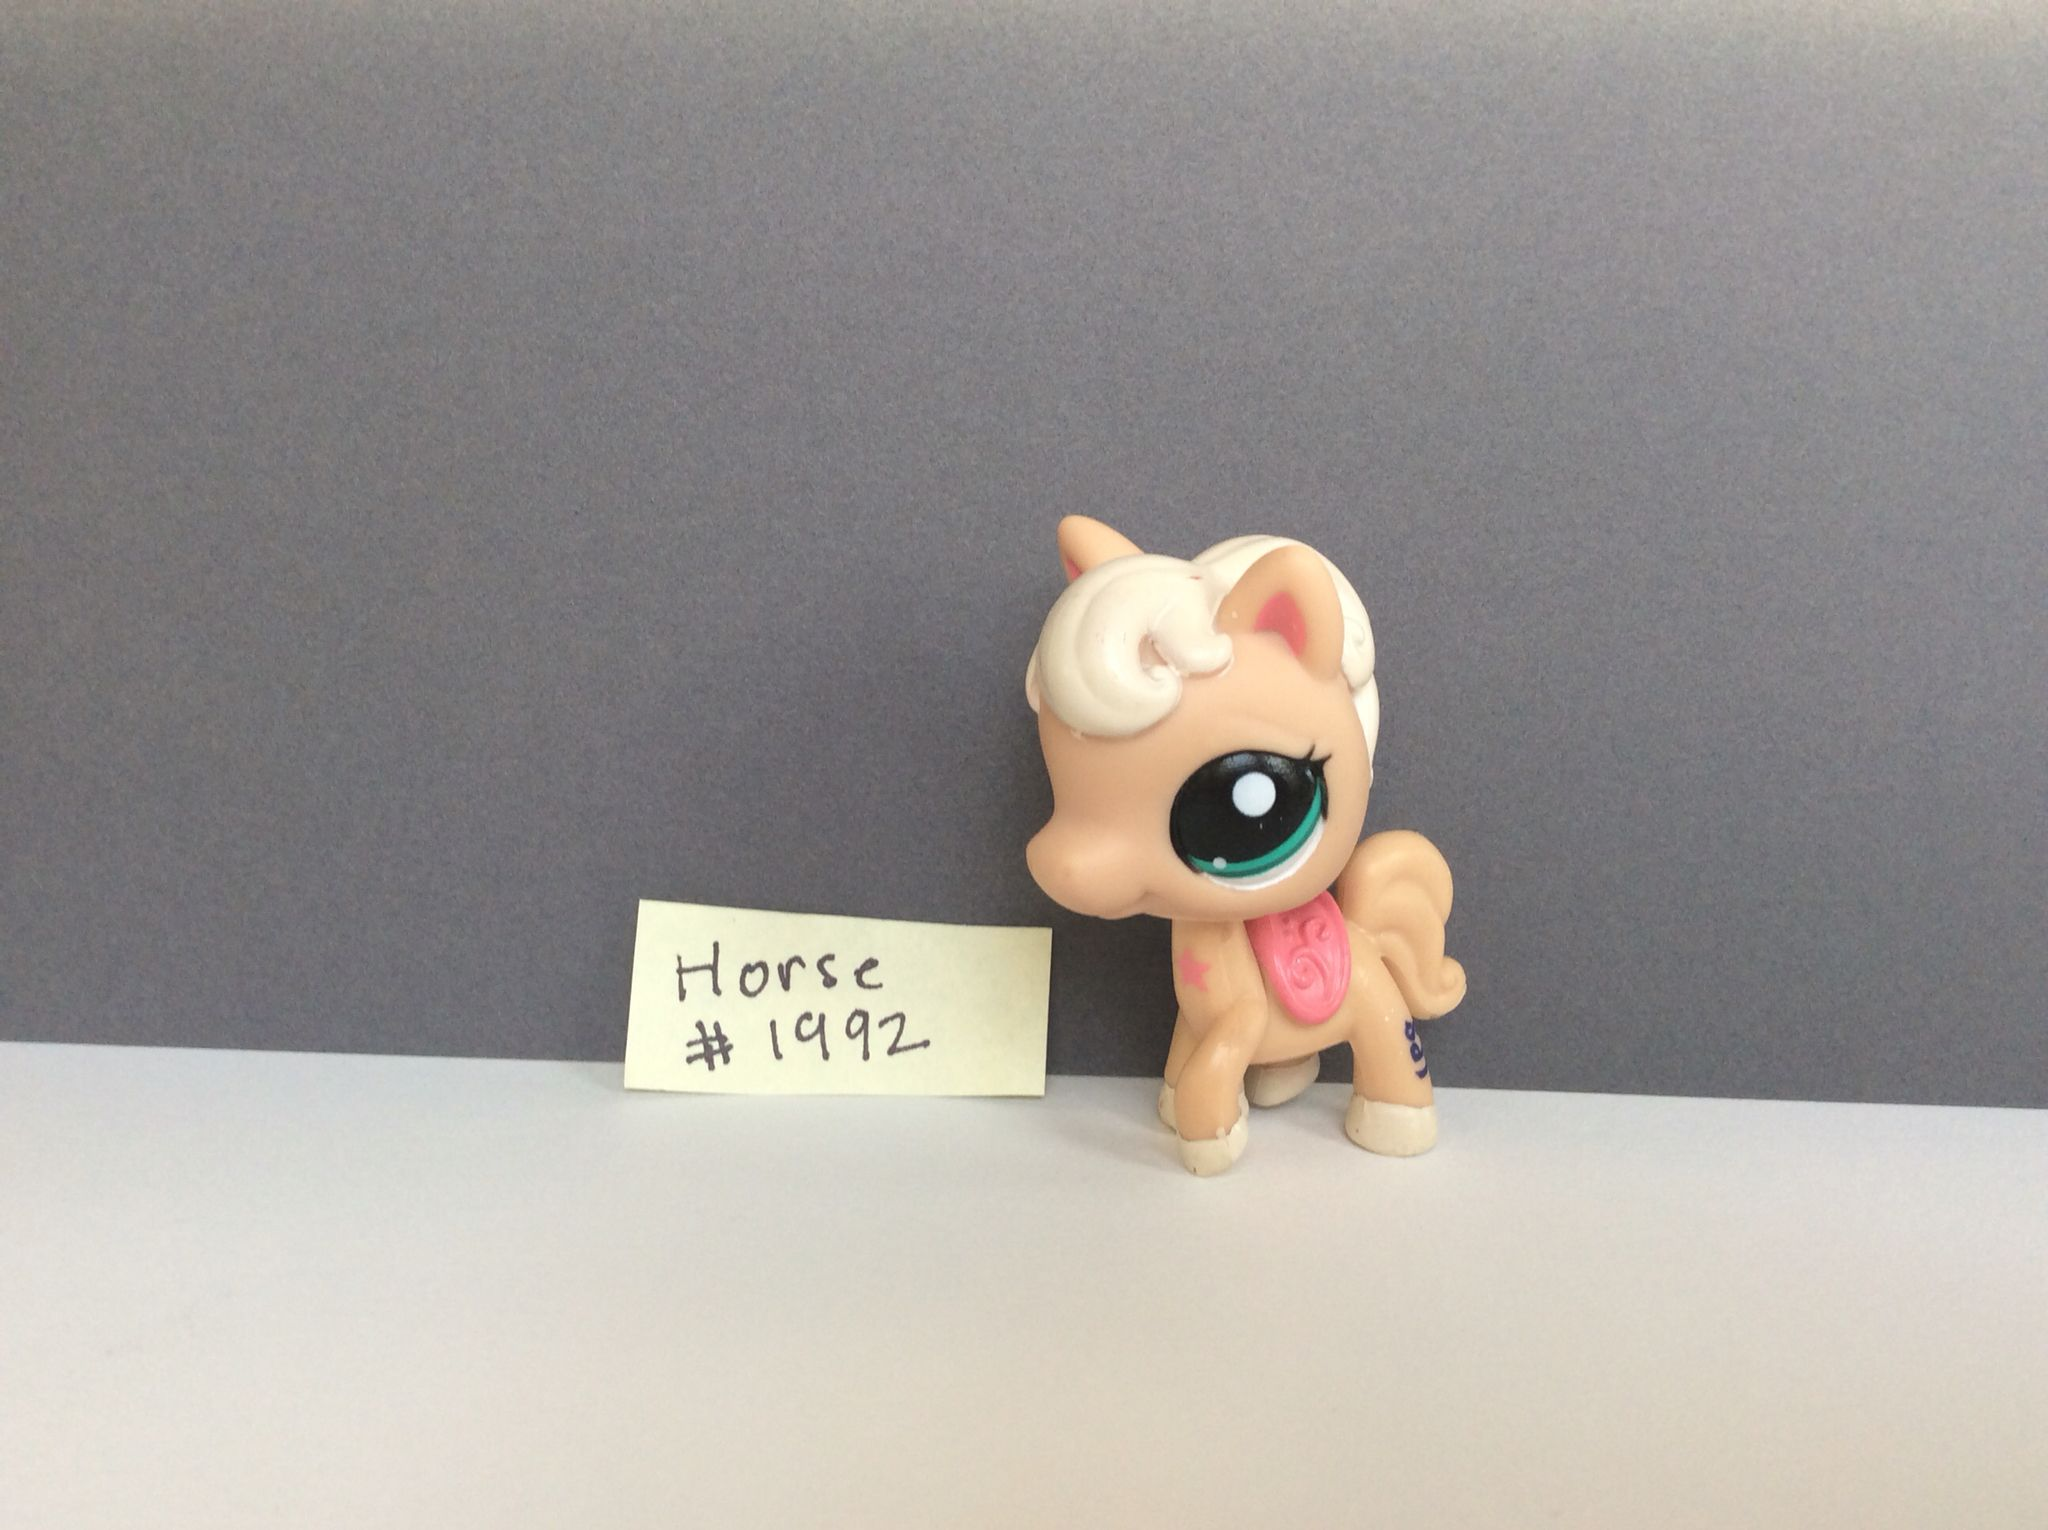 Horse #1992